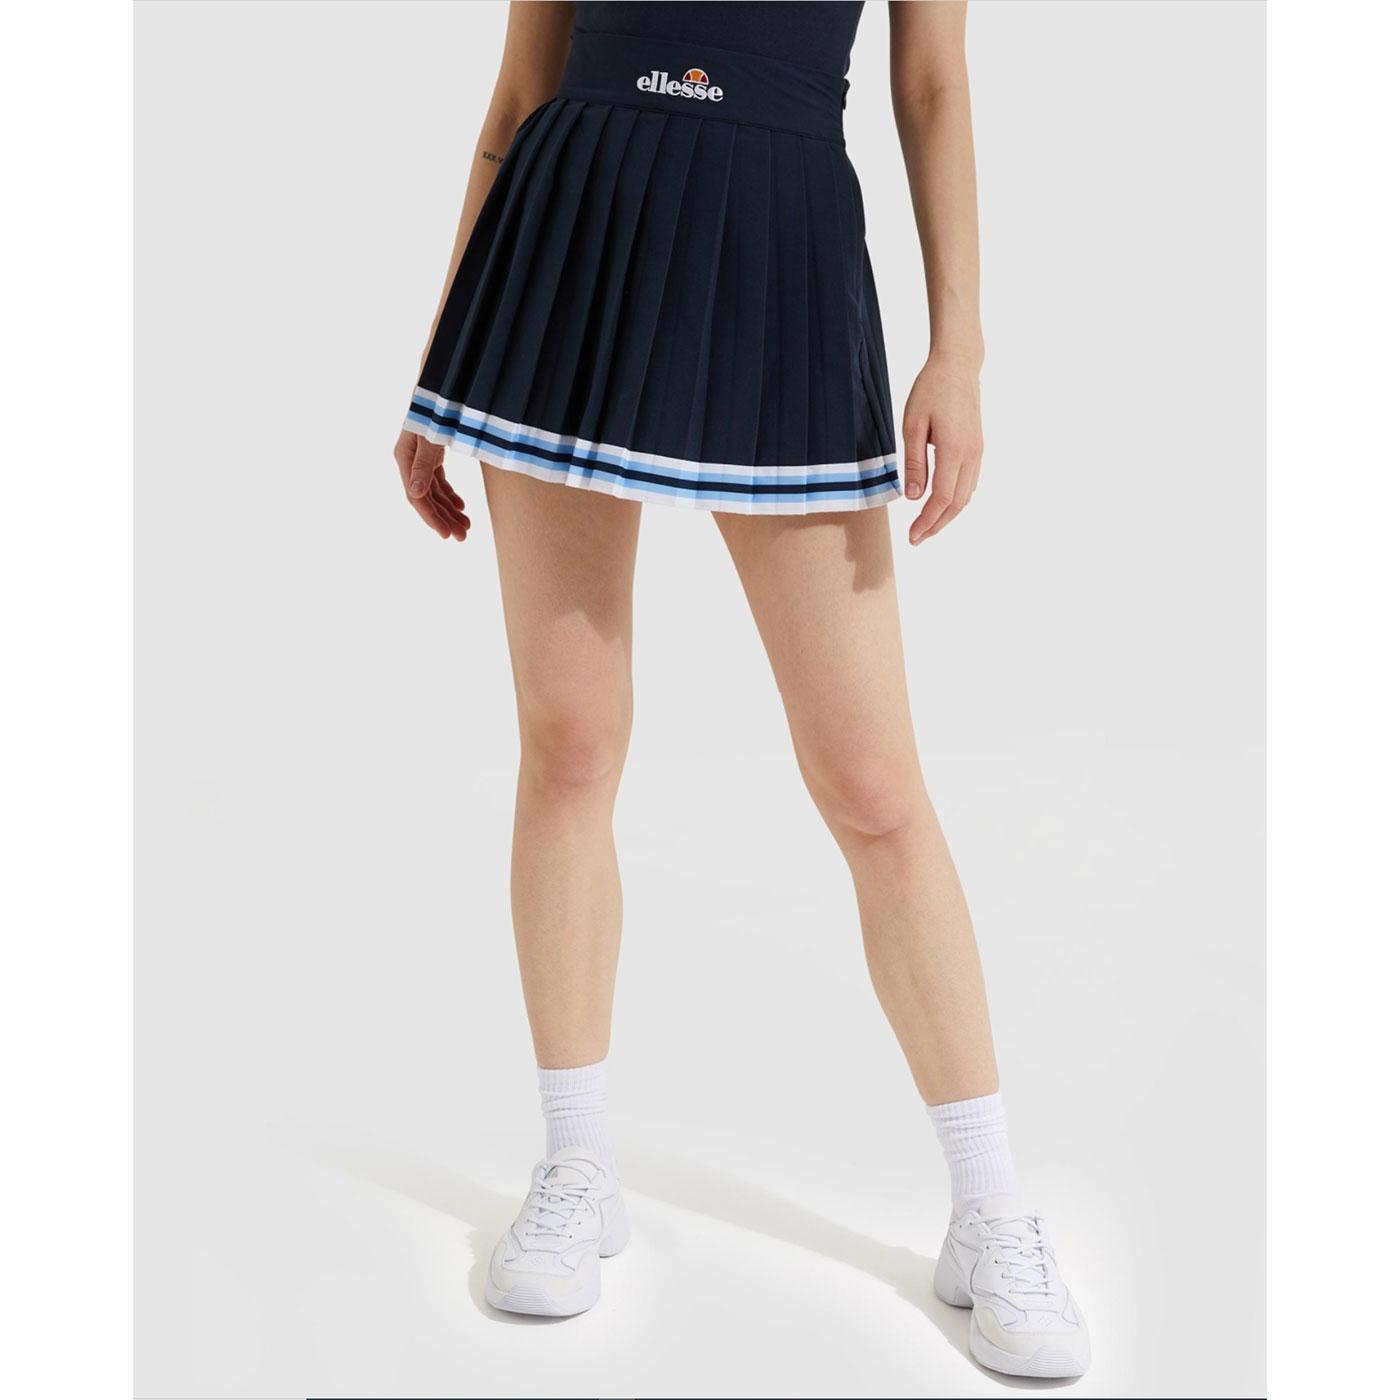 Skate ELLESSE Retro Pleated Tennis Mini Skirt N